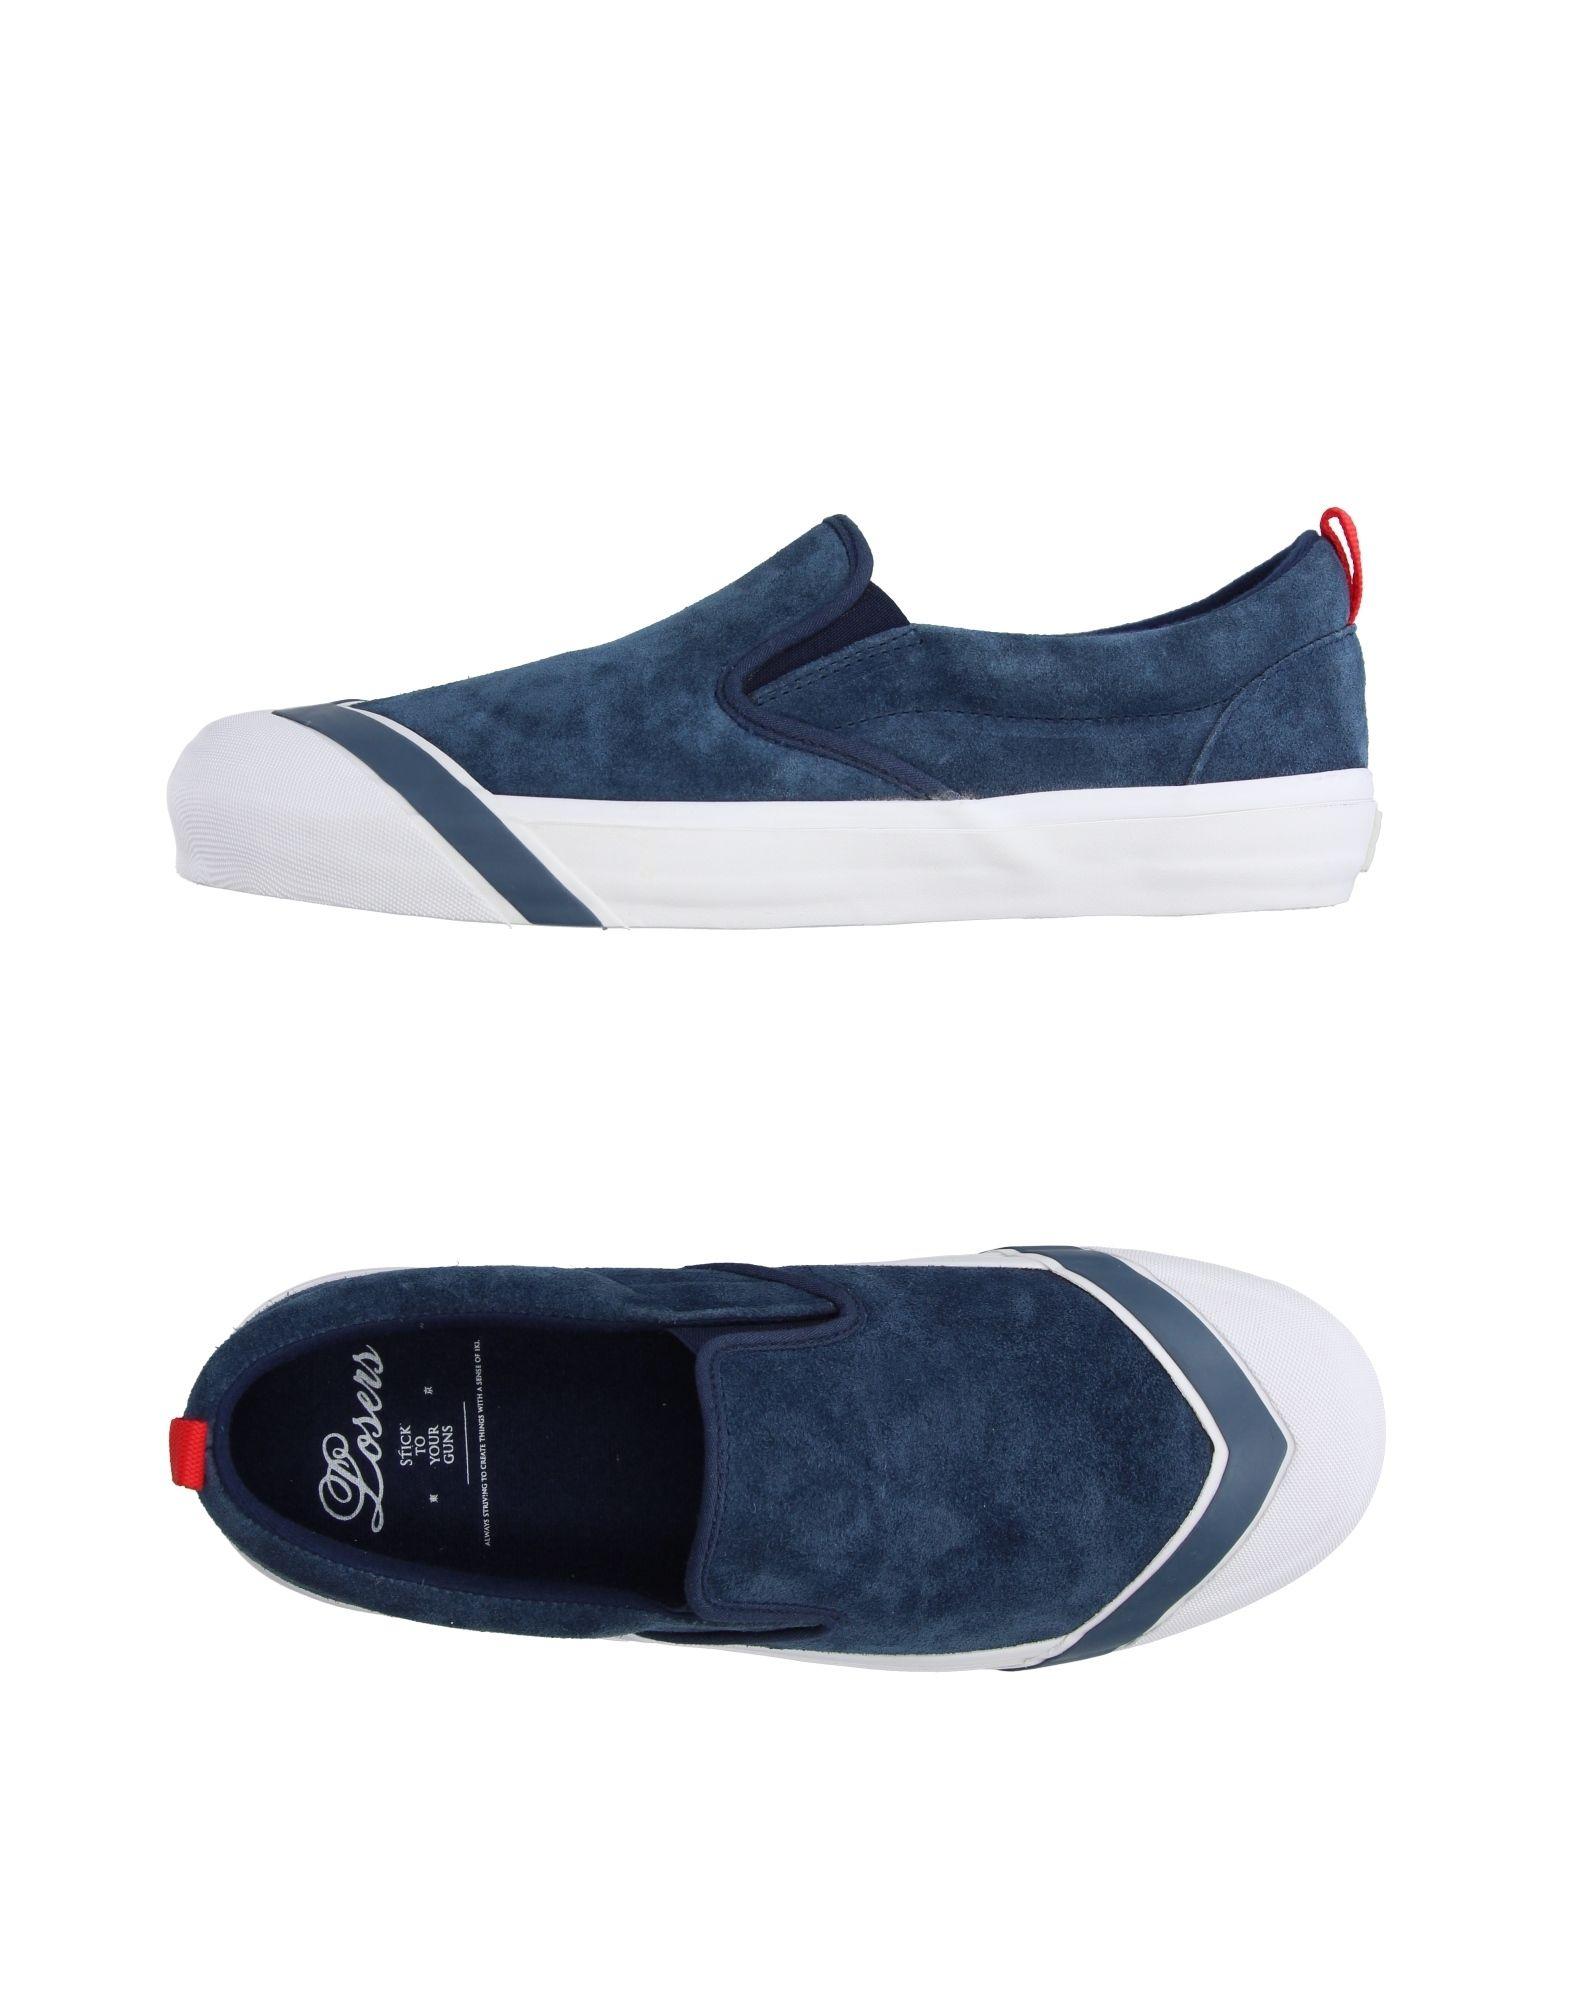 LOSERS Sneakers in Slate Blue